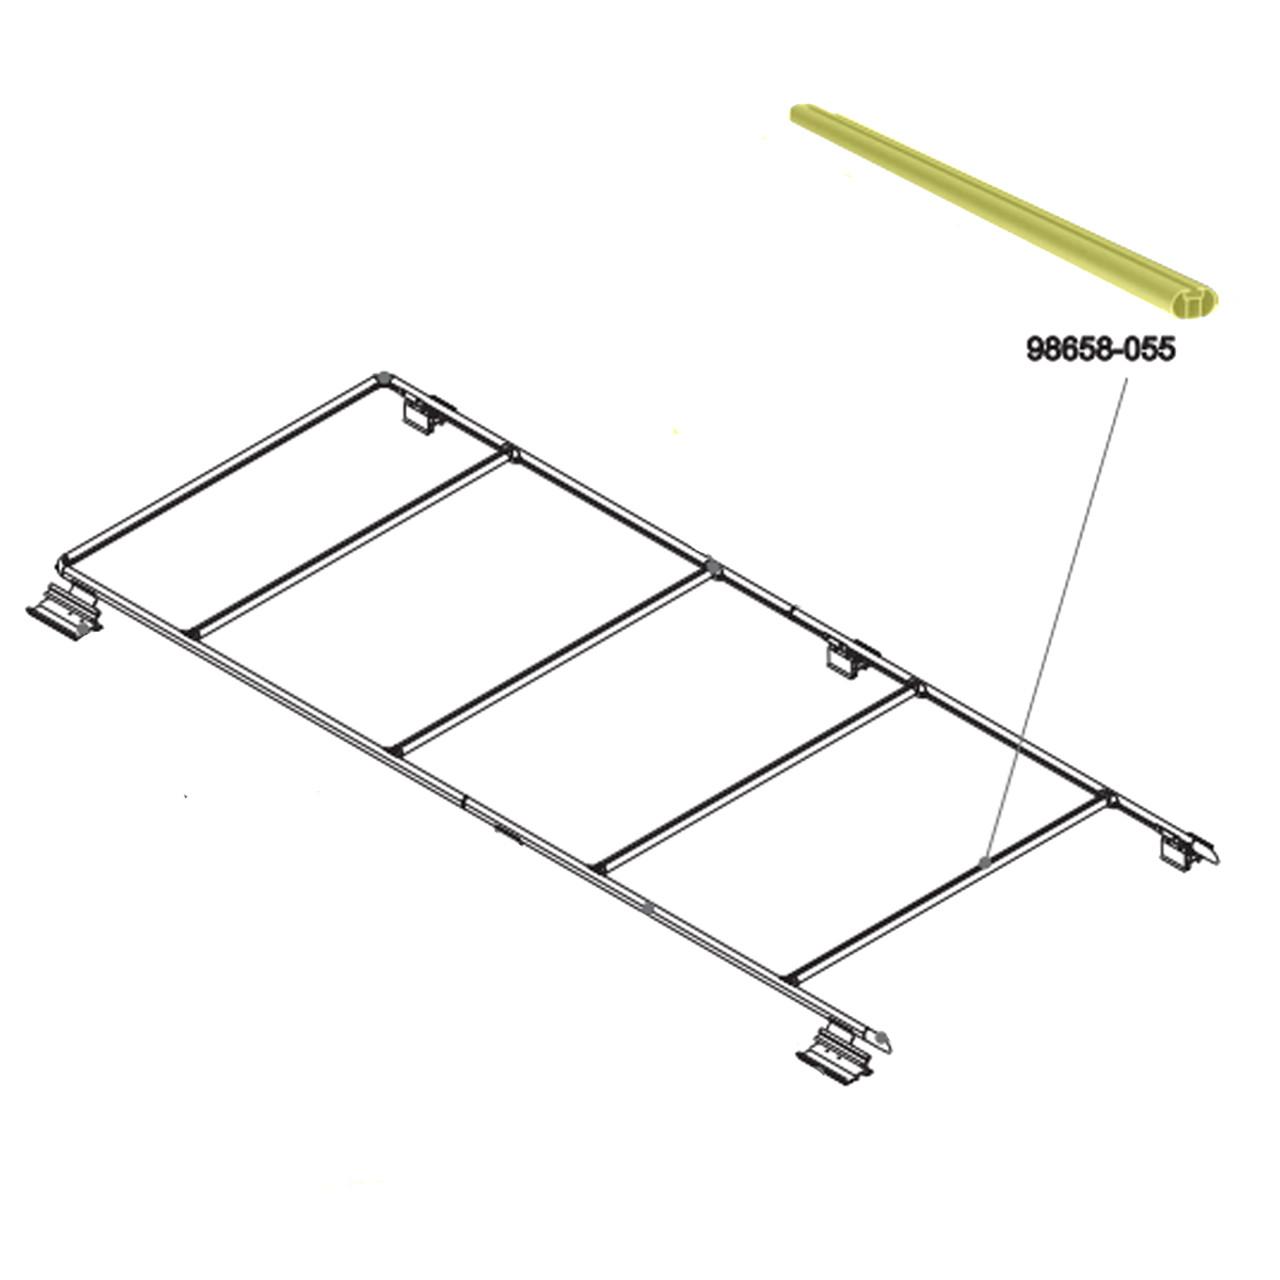 fiamma 98658 055 oem dodge promaster roof rack crossmember rail